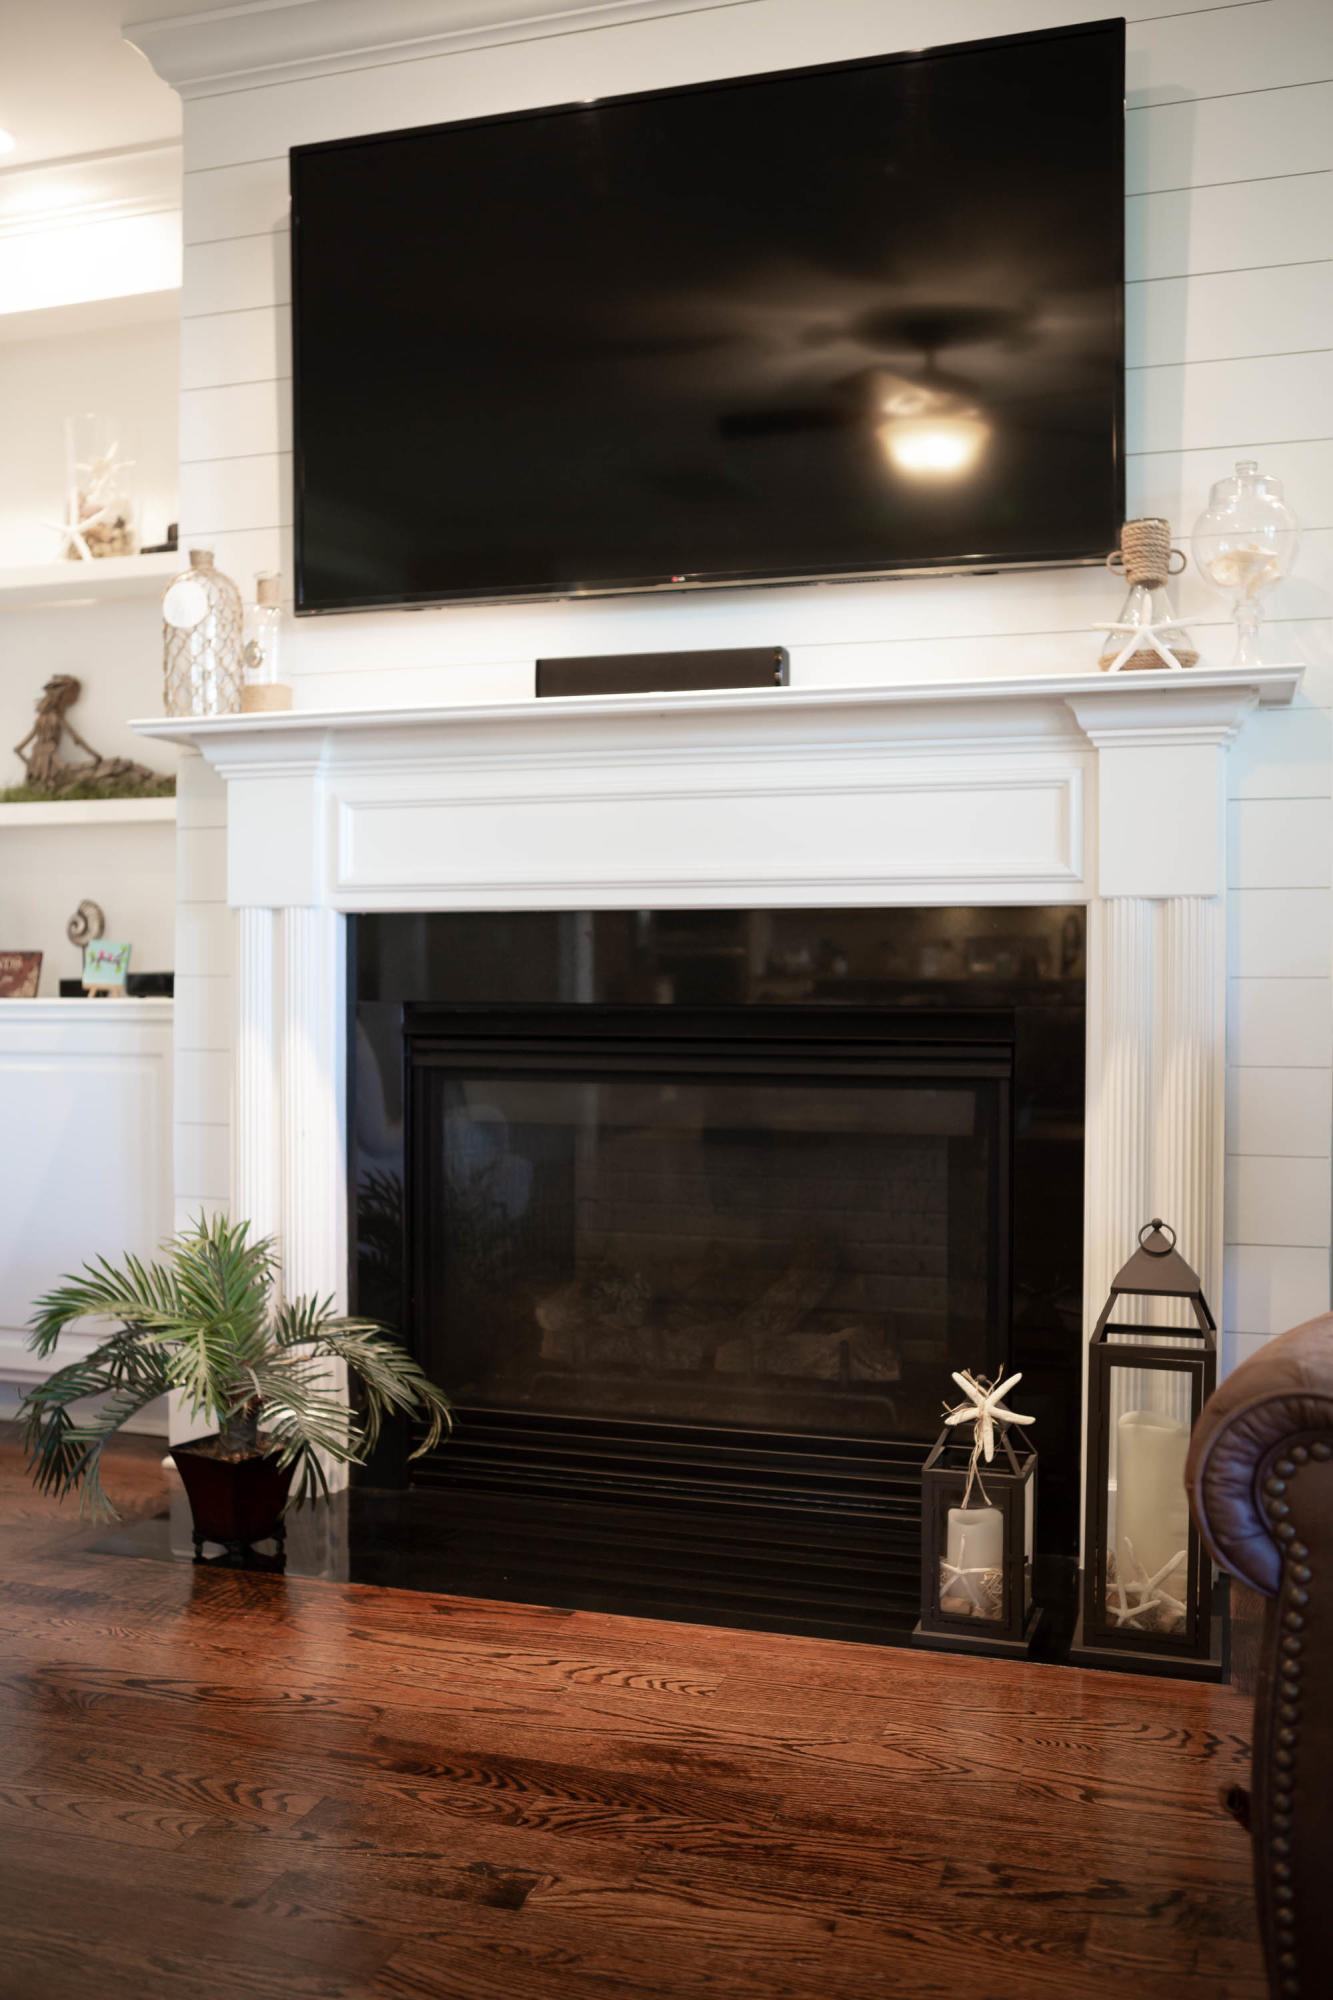 Dunes West Homes For Sale - 3216 Hatchway, Mount Pleasant, SC - 38